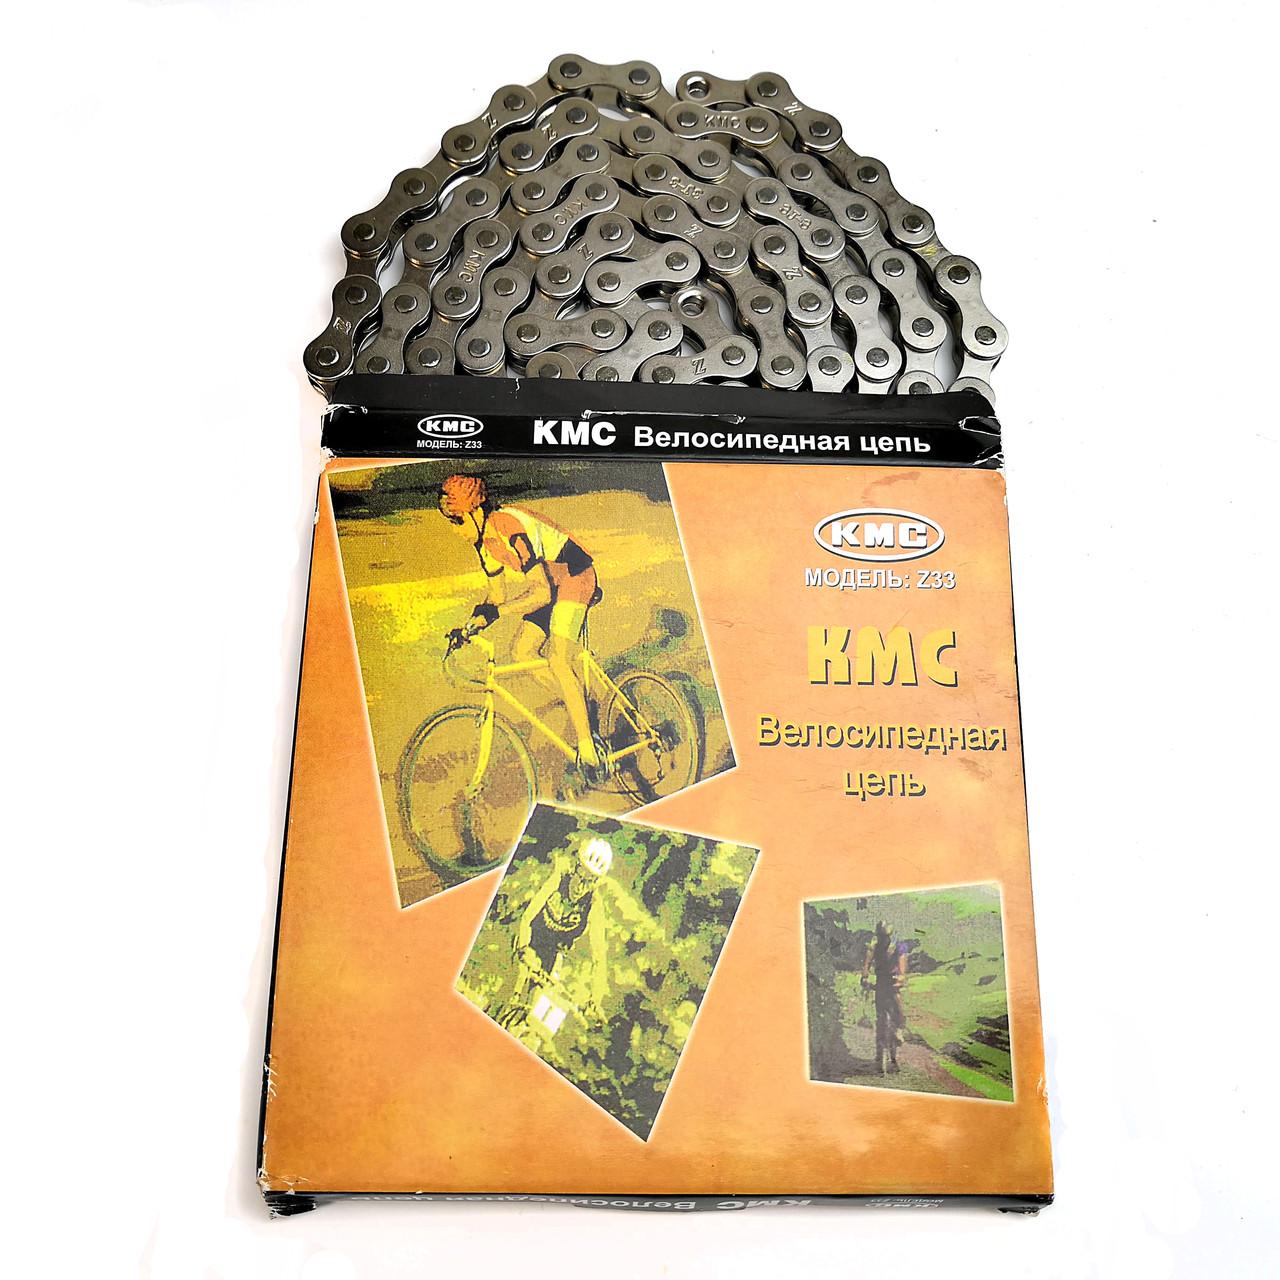 Велосипедная цепь KMC Z33 под 6 звезд, хром